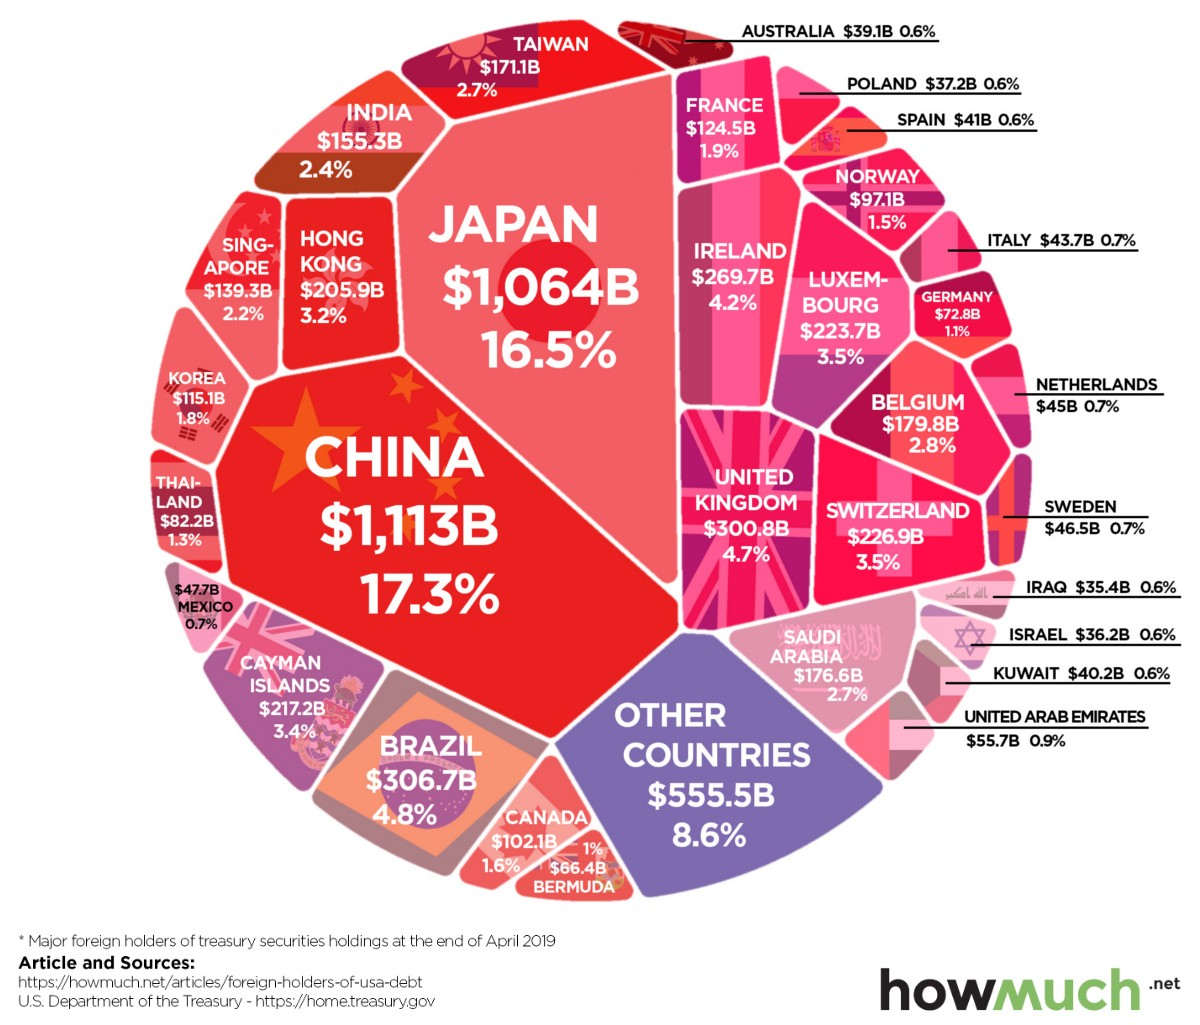 Countries that own U.S. debt